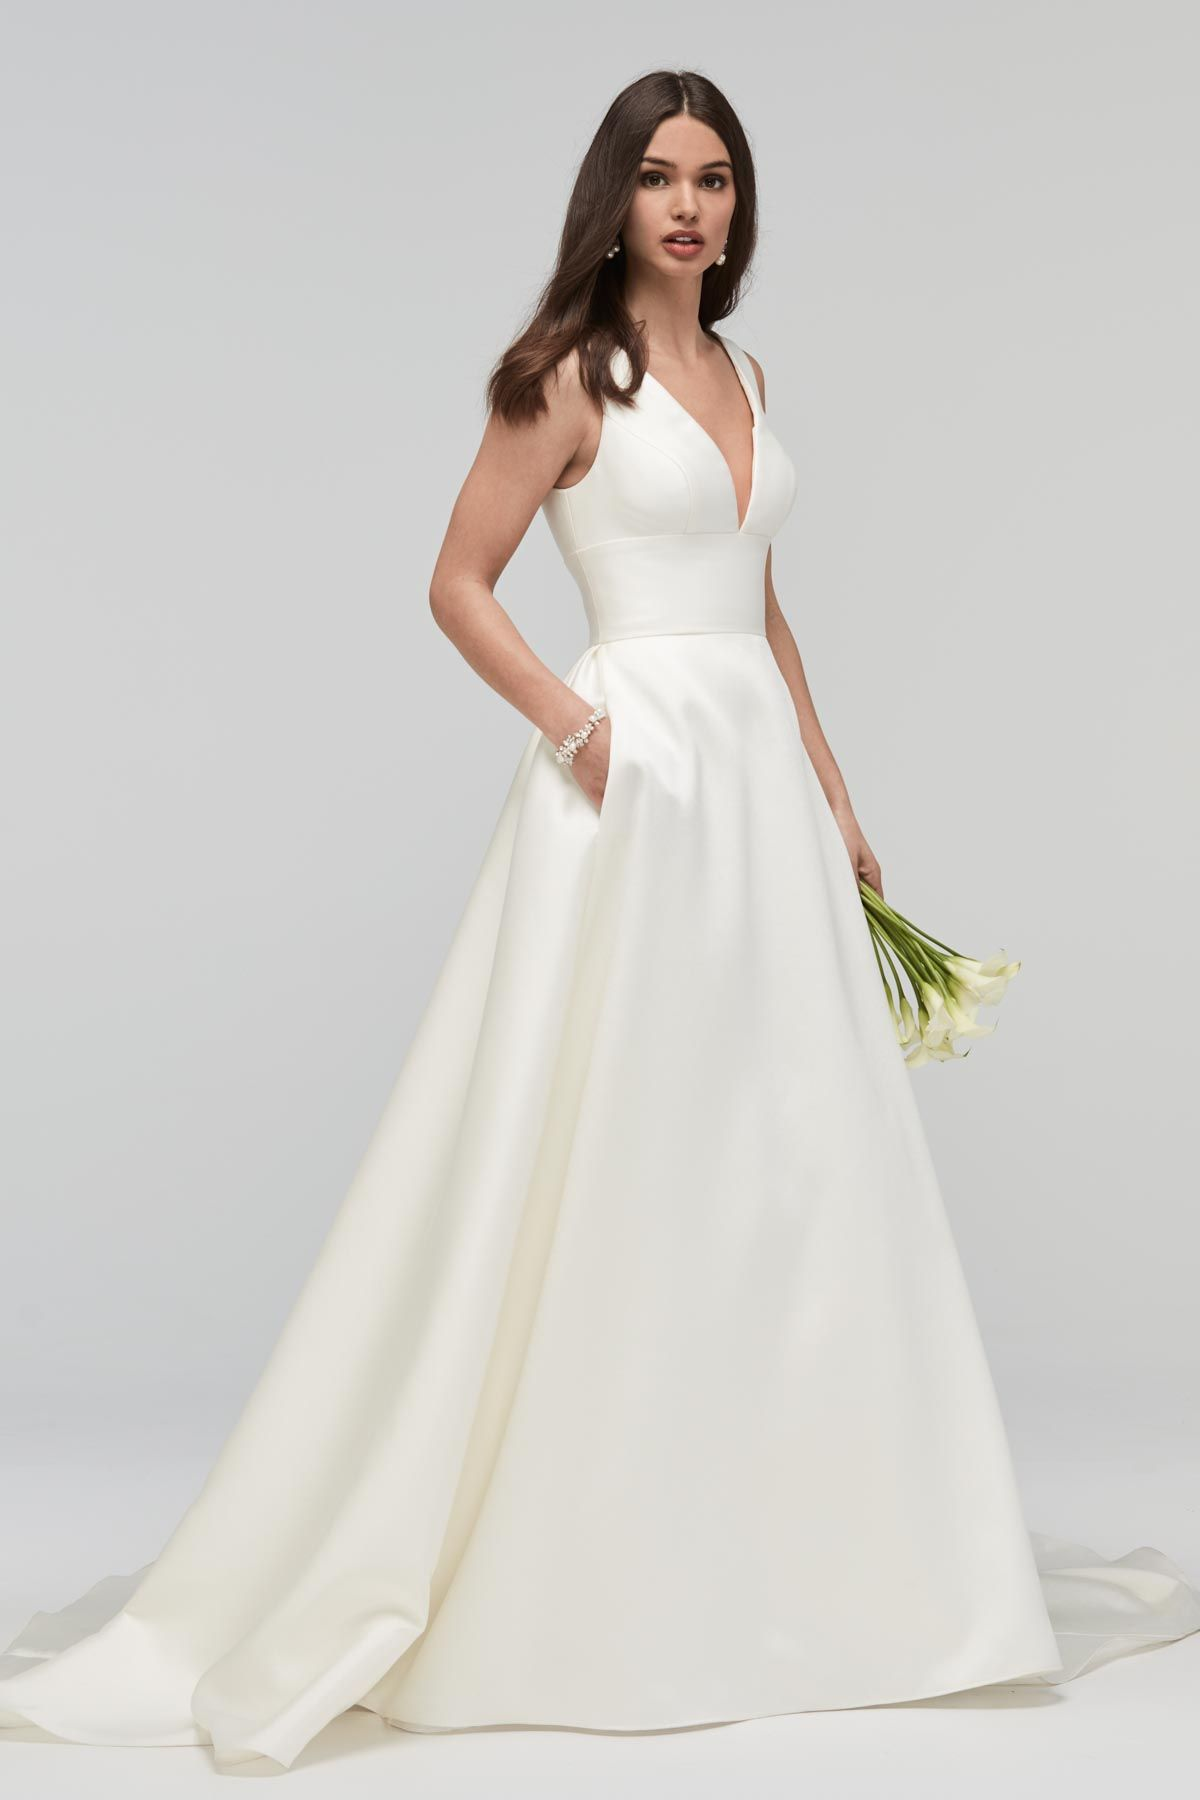 Andrina wtoo a modern twist on classic and romantic wedding